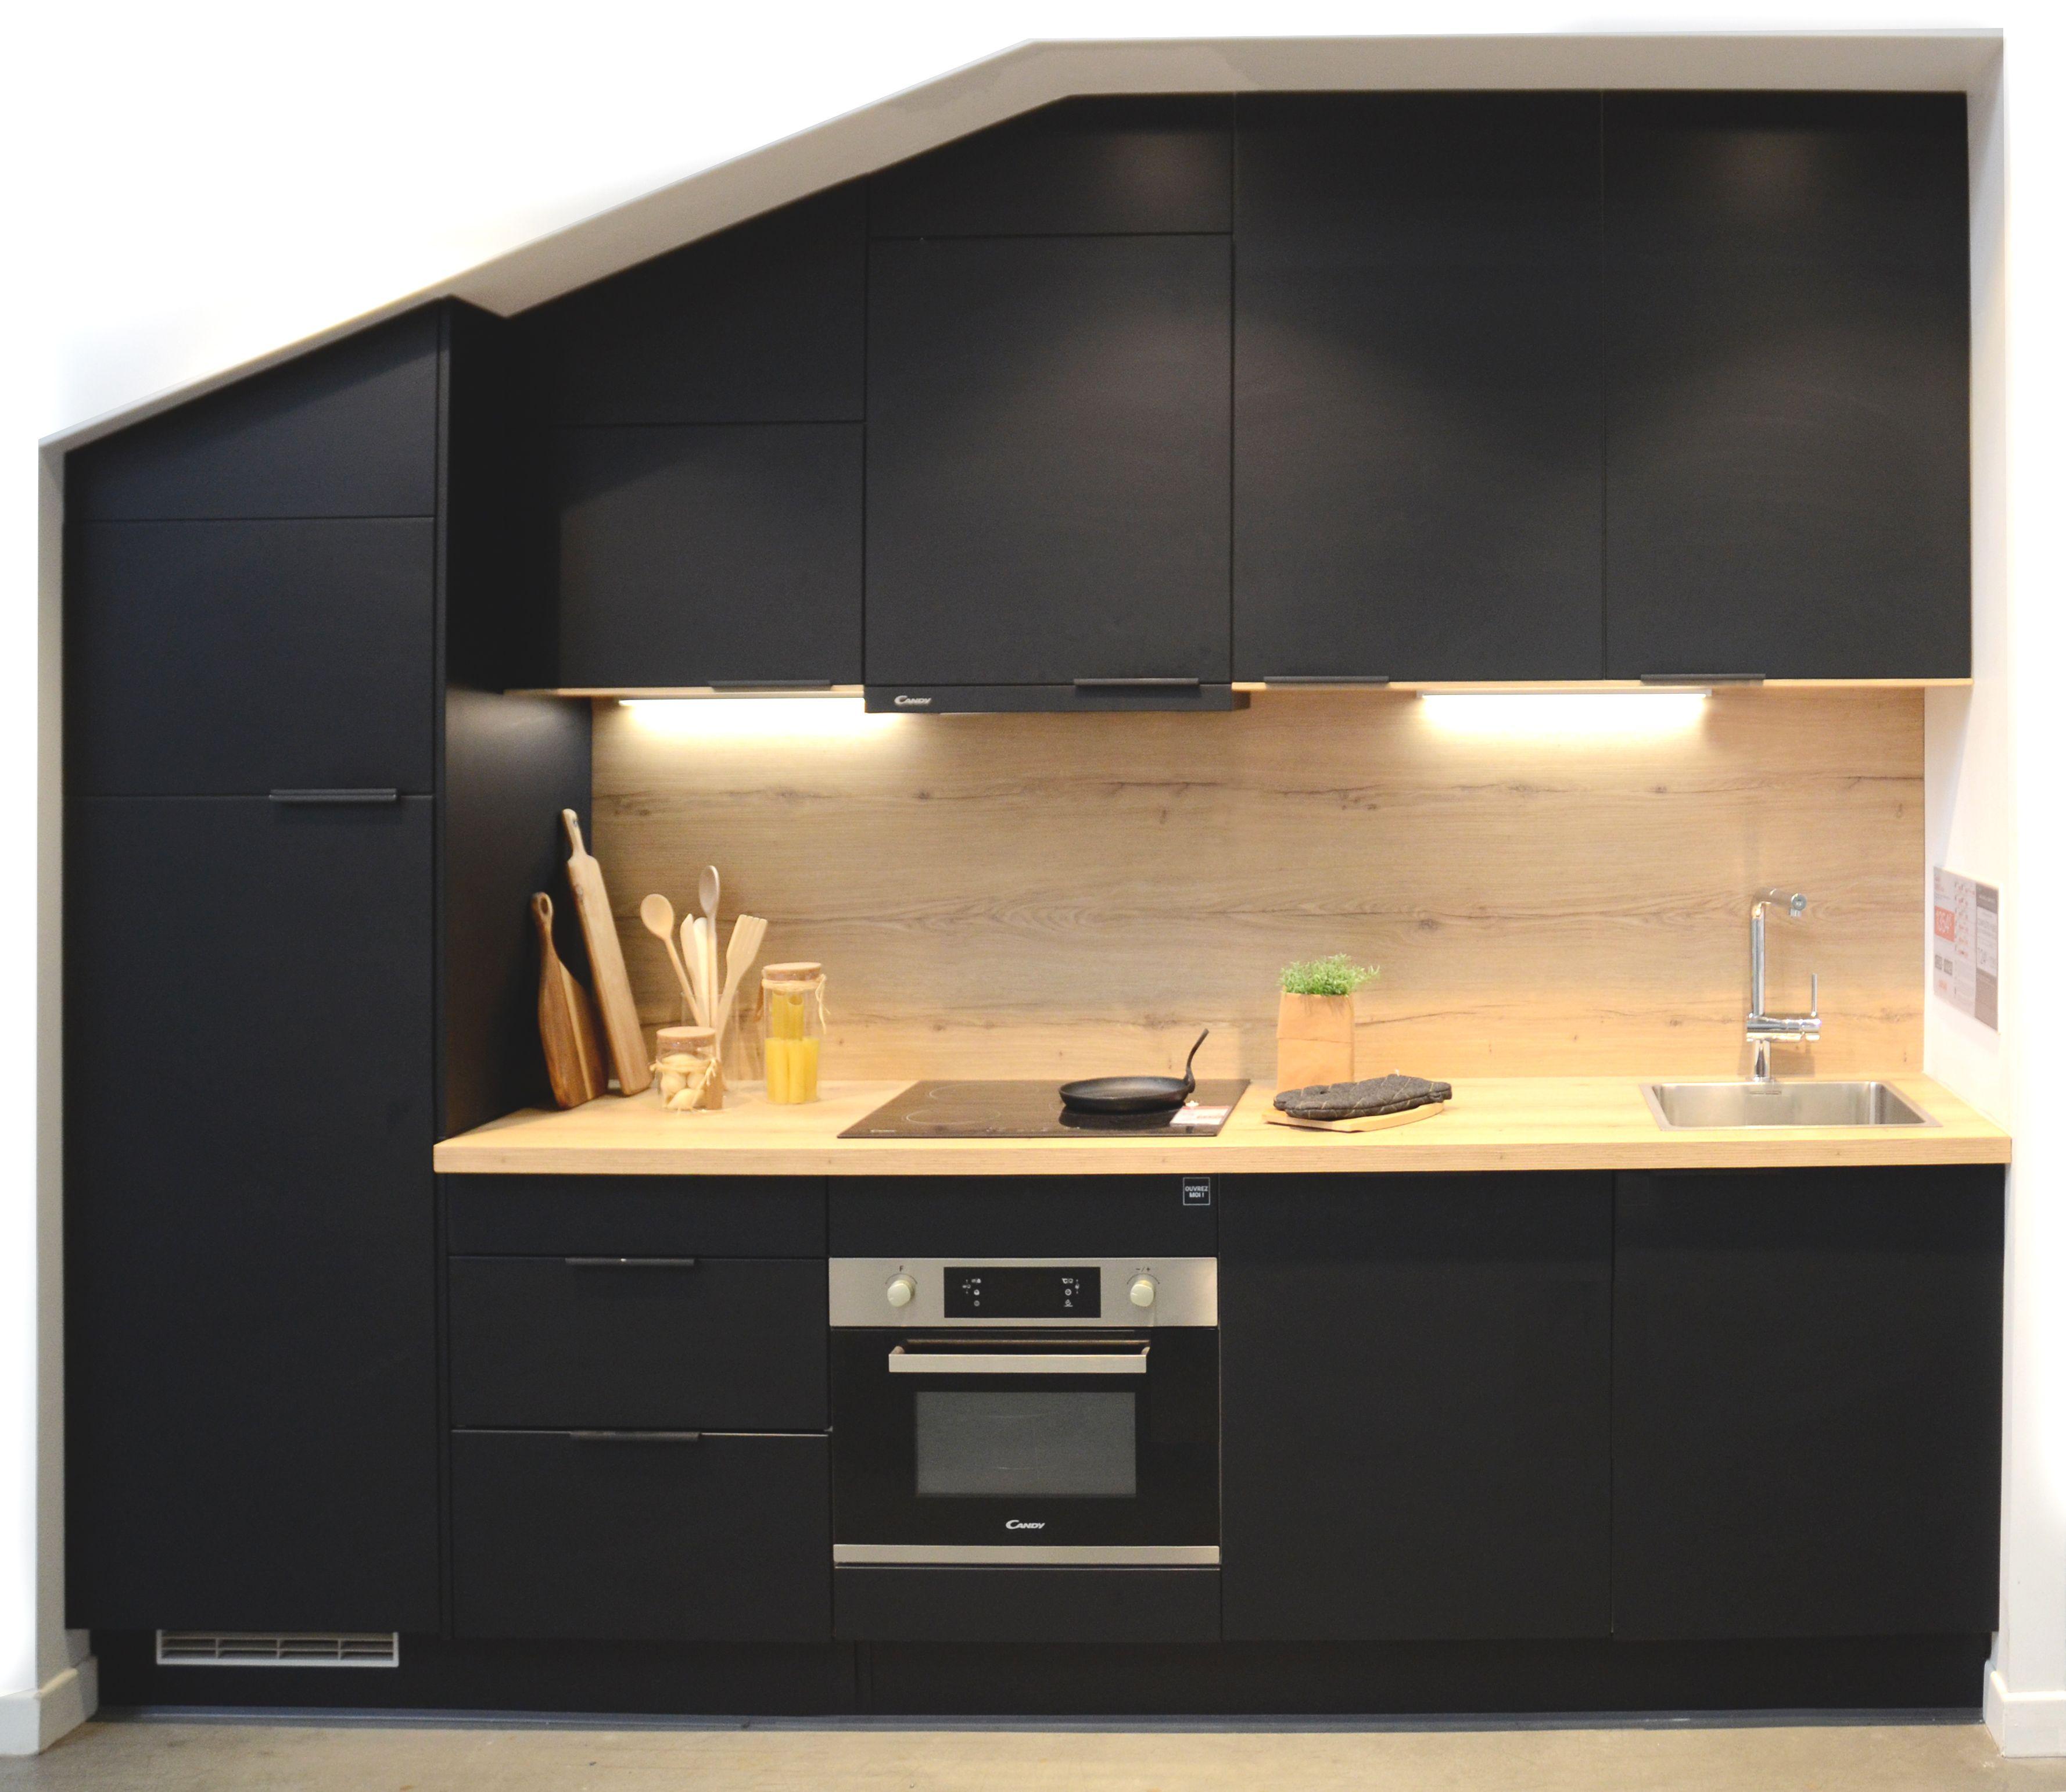 Cuisine Noire Porte Effet Soft Touch Ginko Noir Mat Oskab Cuisine Cuisine Oskab Oskab